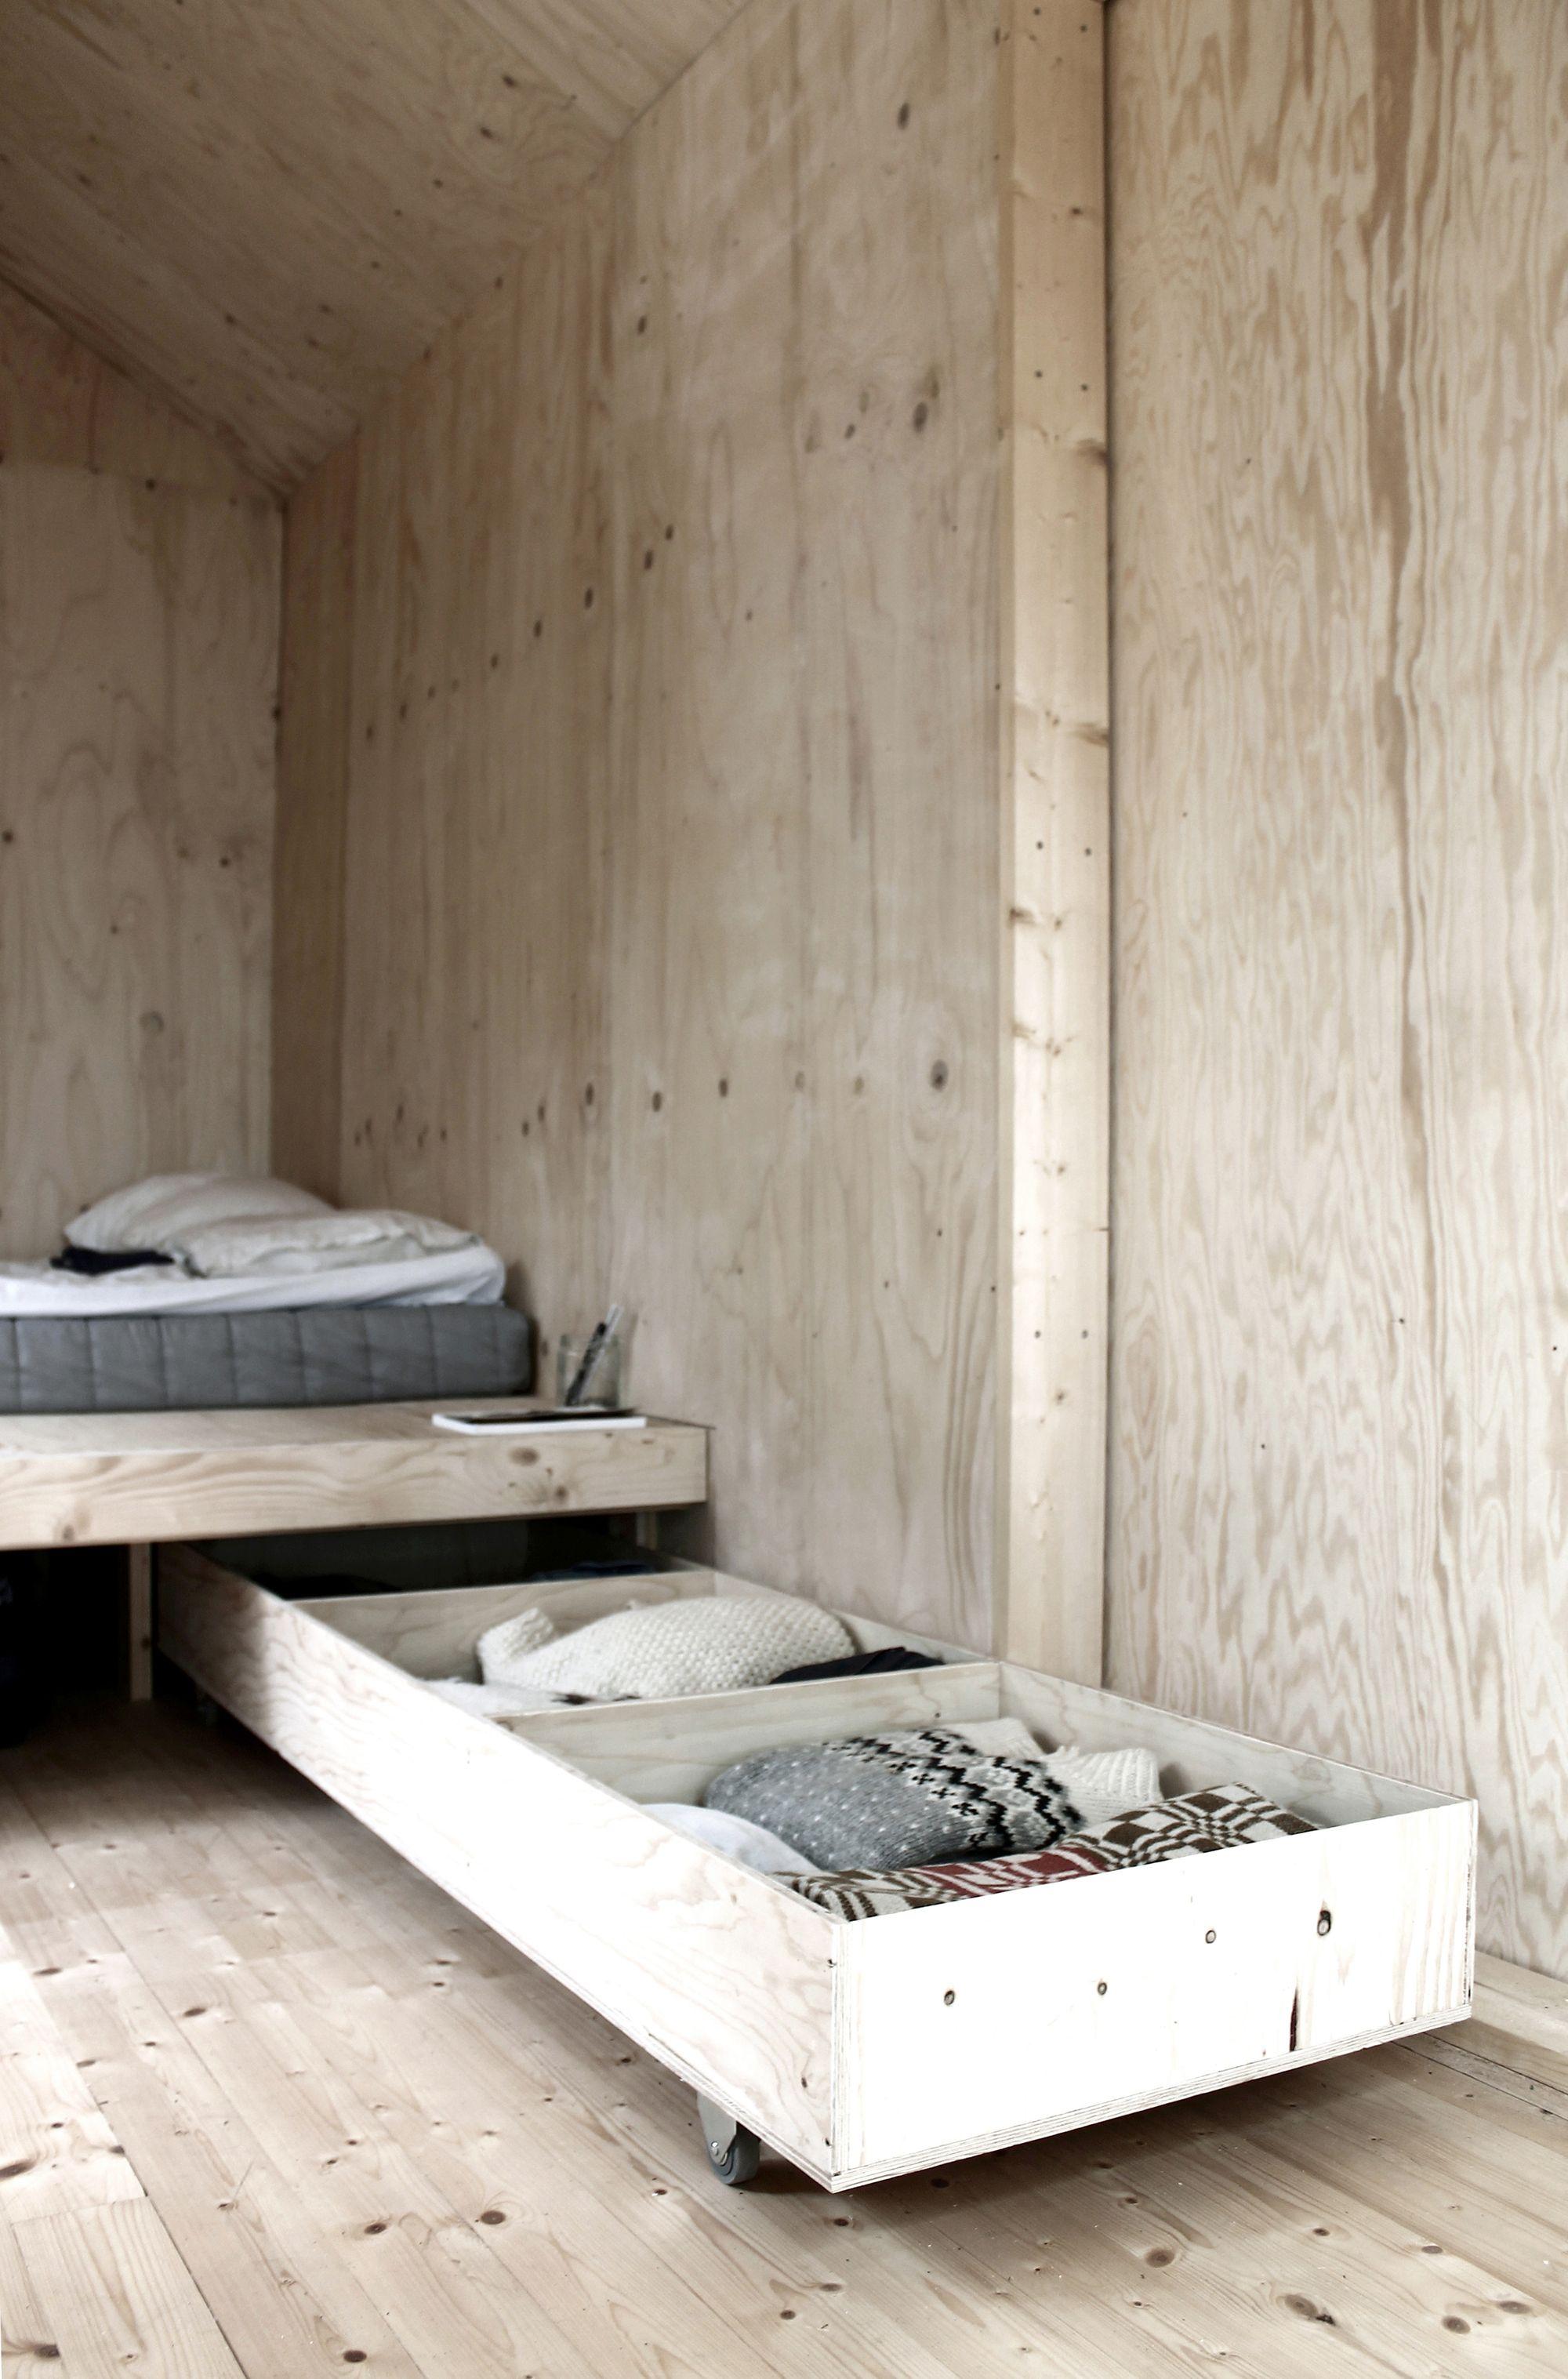 Lit Au Milieu D Une Chambre a small cabin in the woodsseptembre architecture